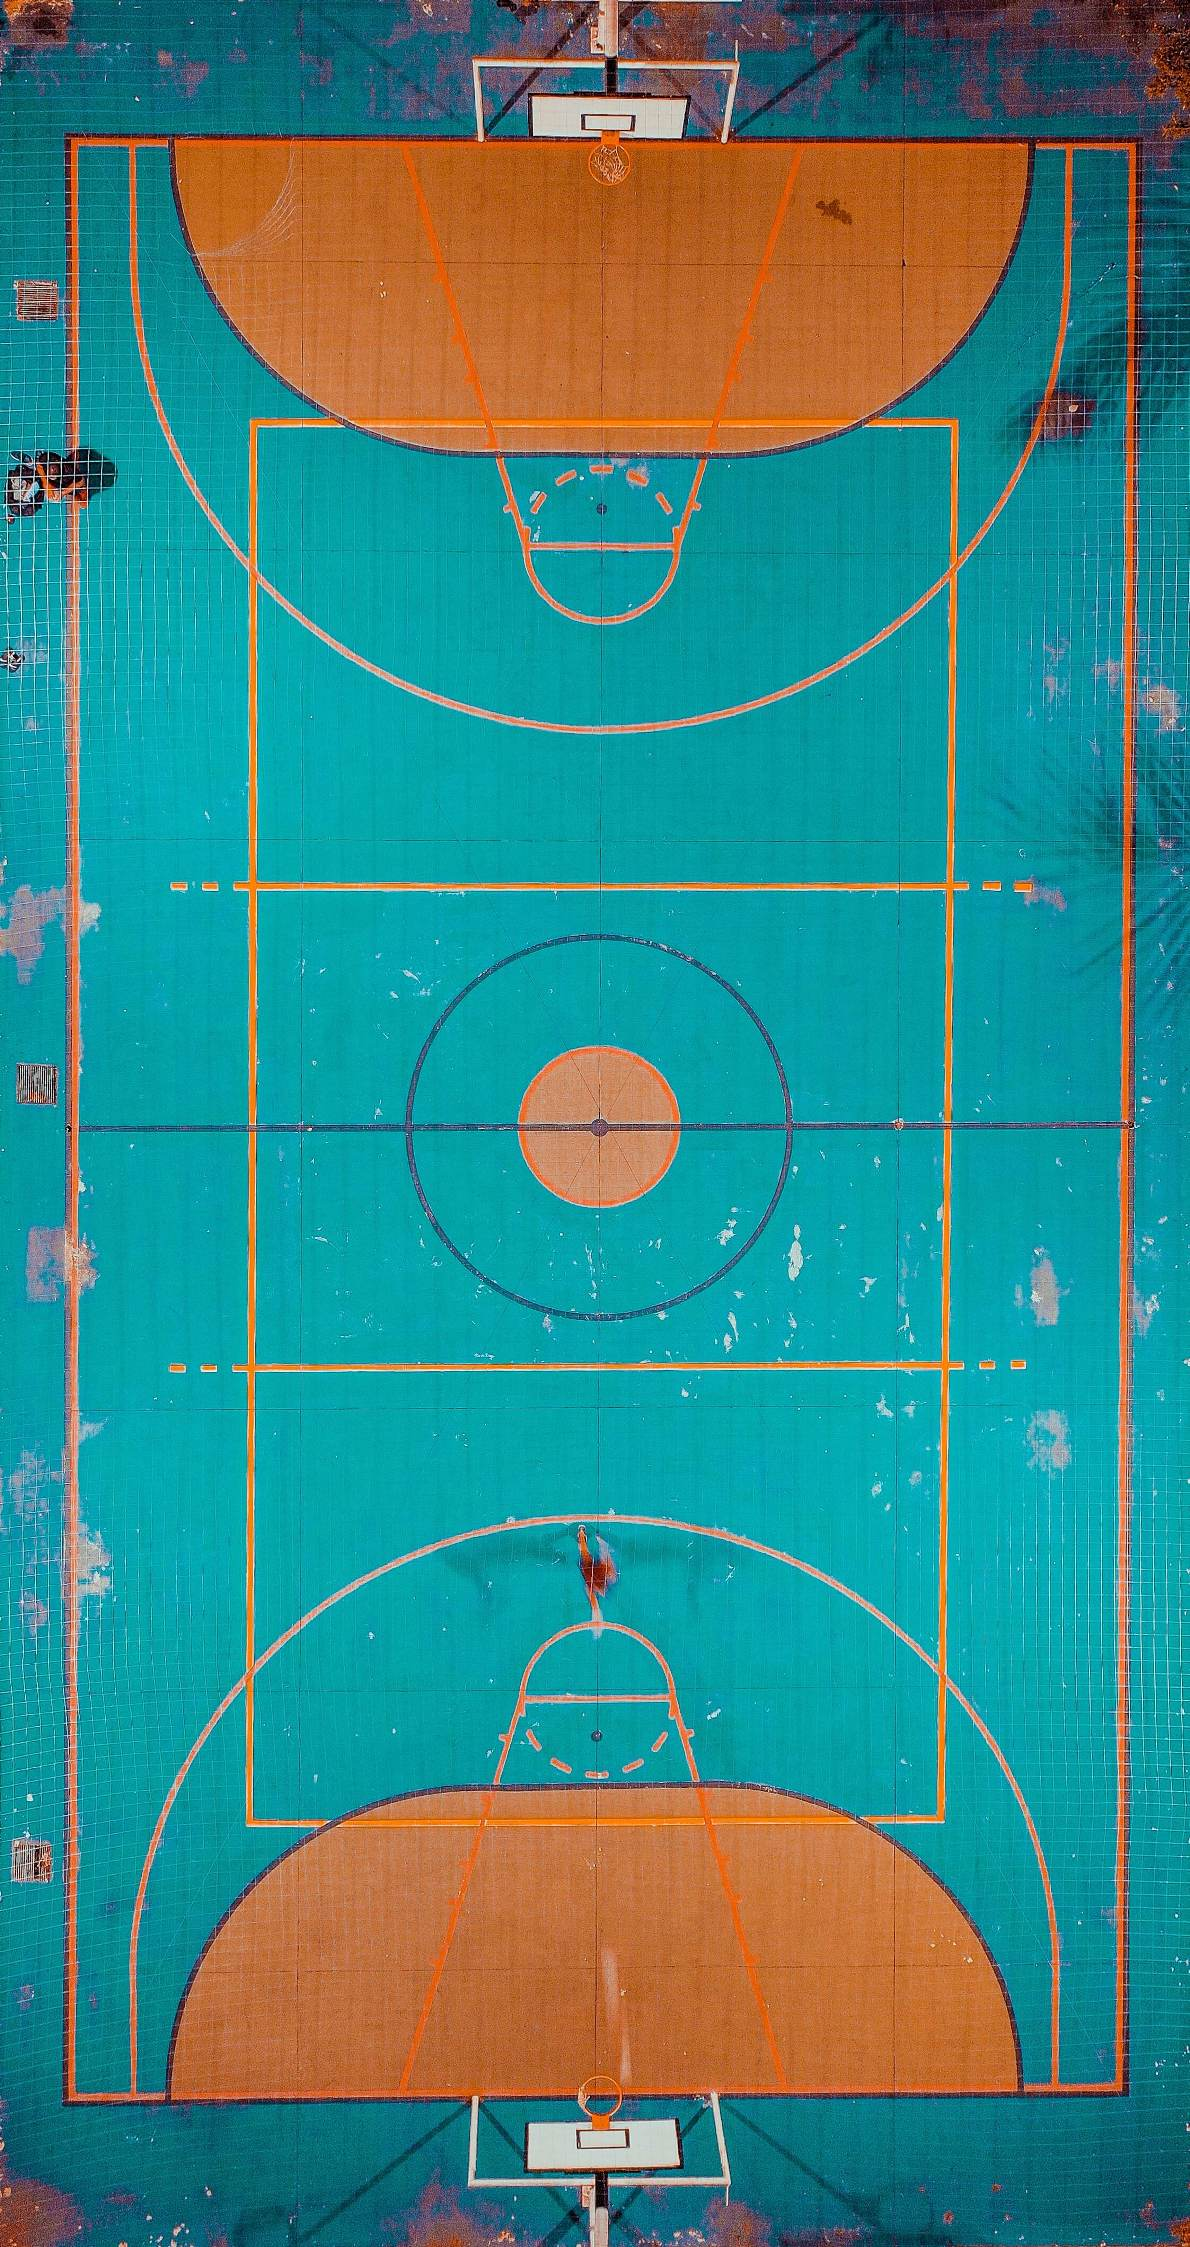 Открытый урок по мини баскетболу